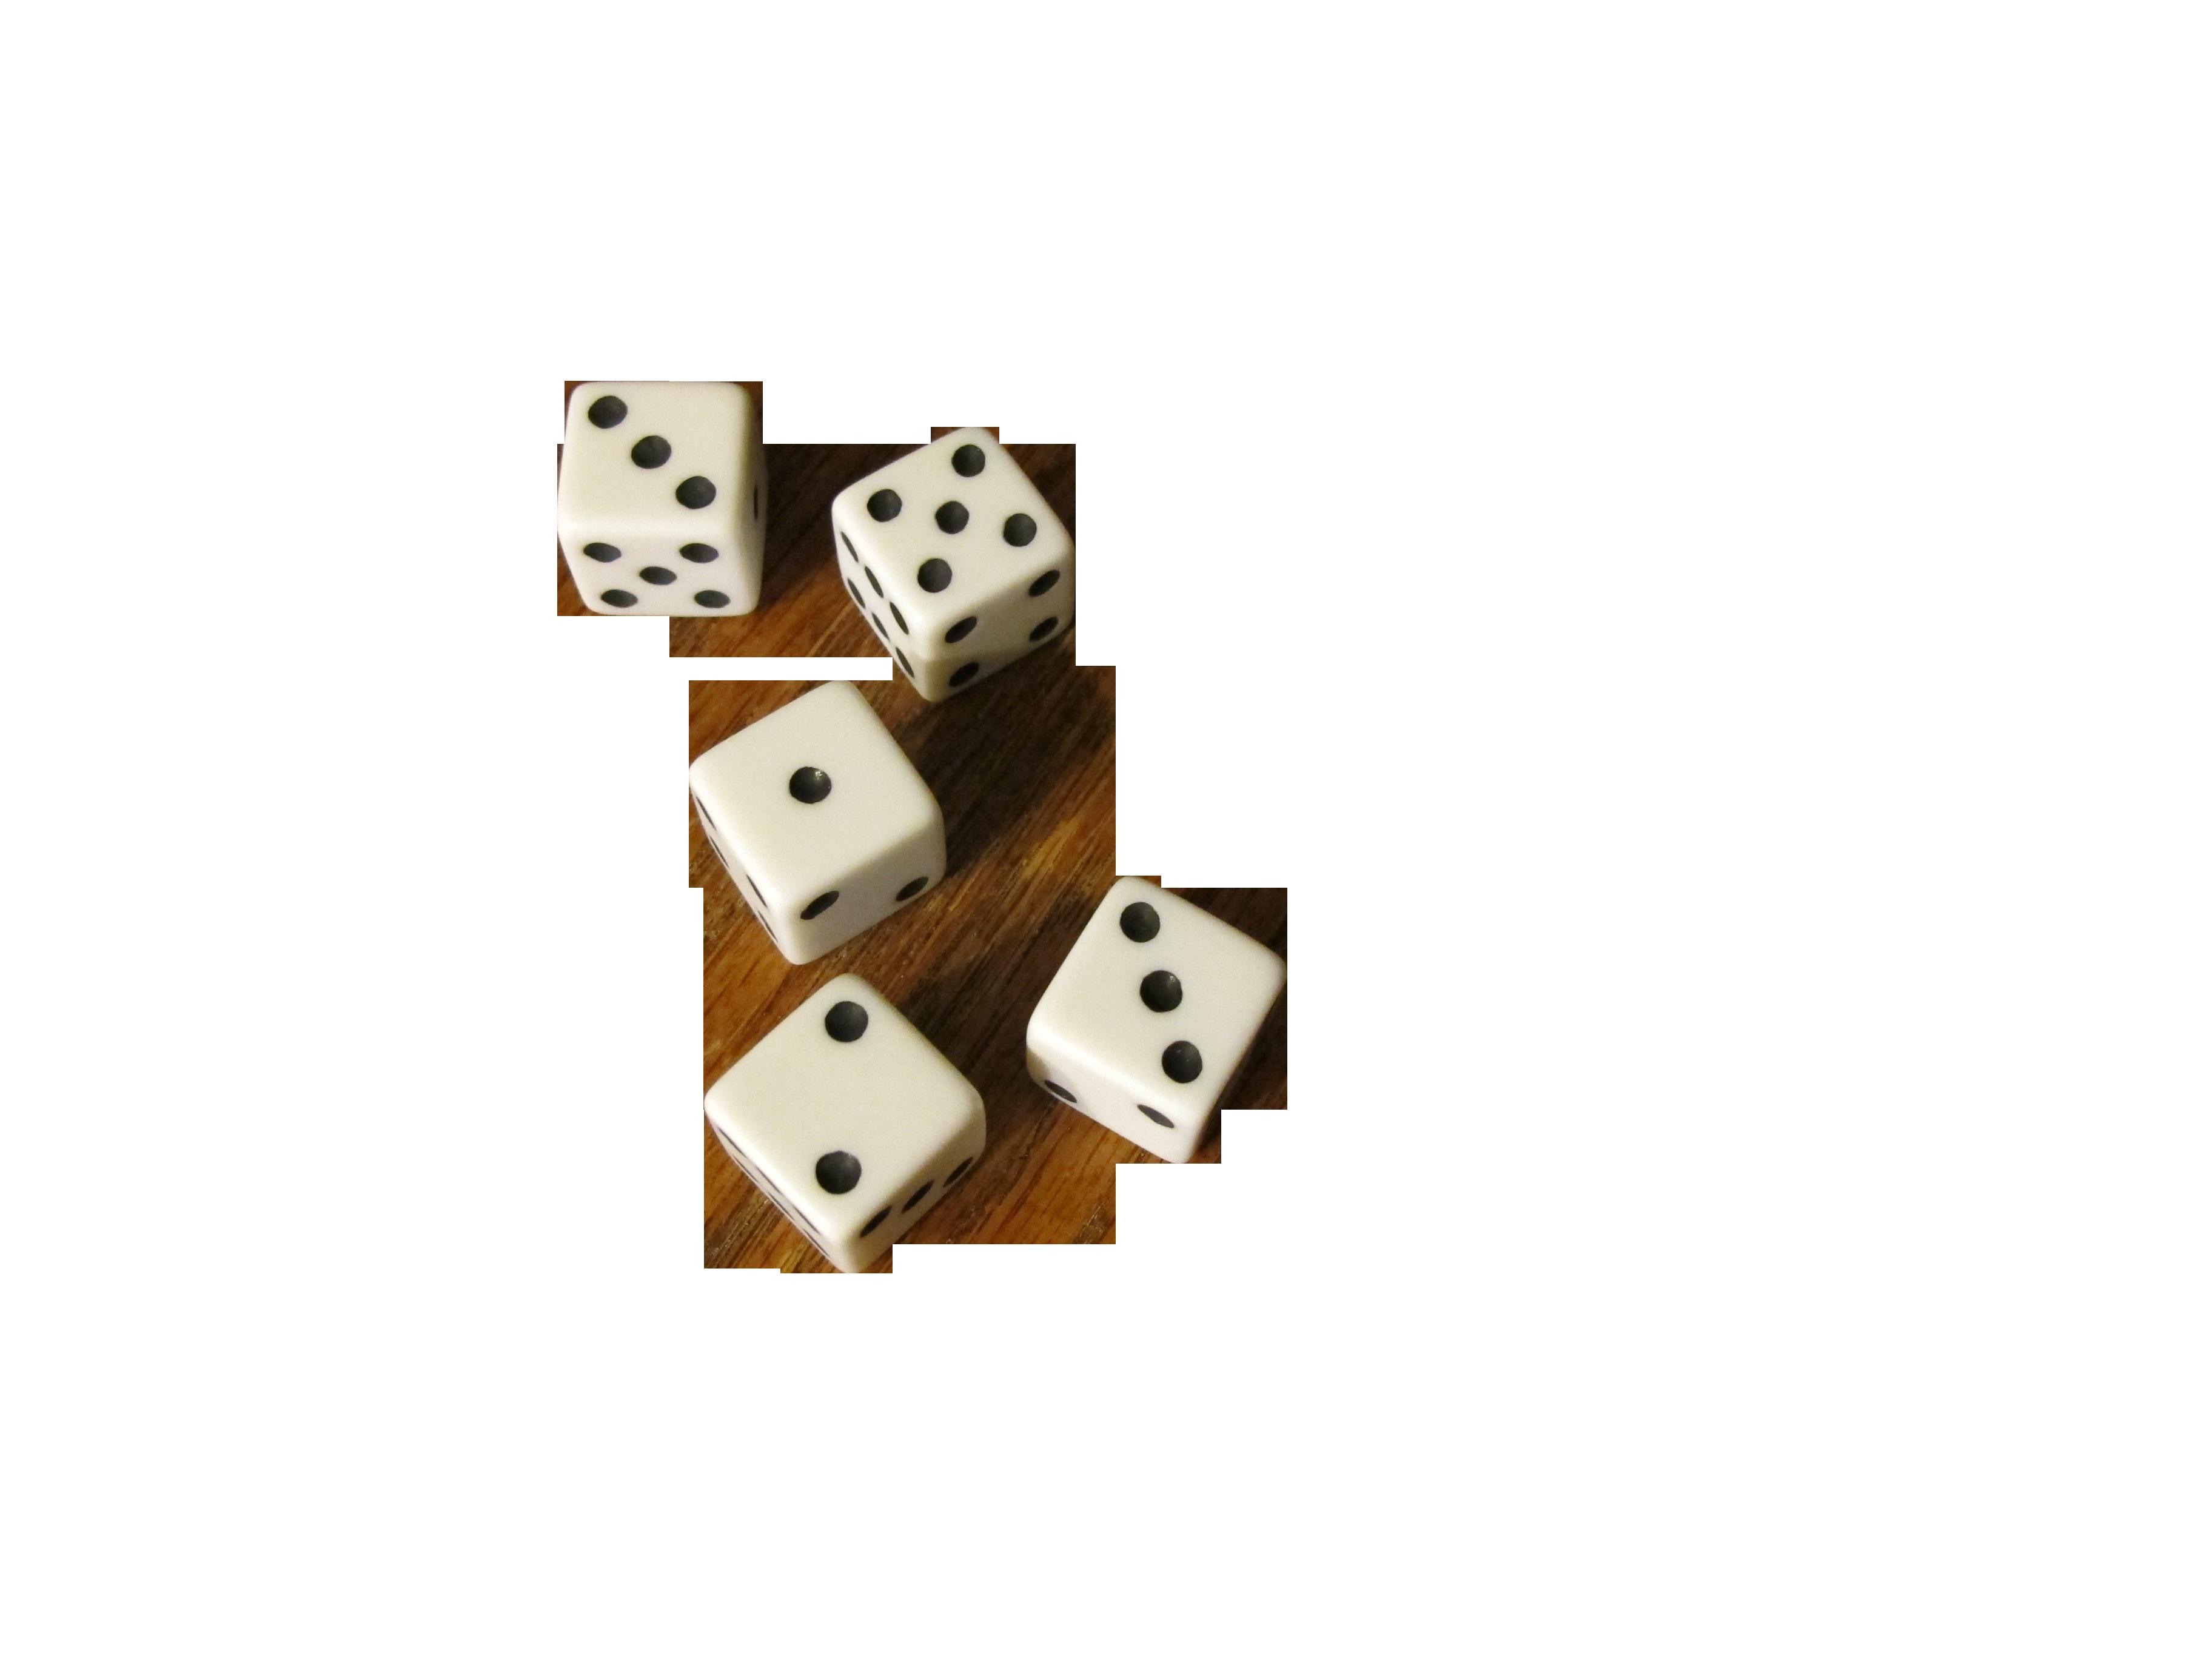 dice-606651_Clip